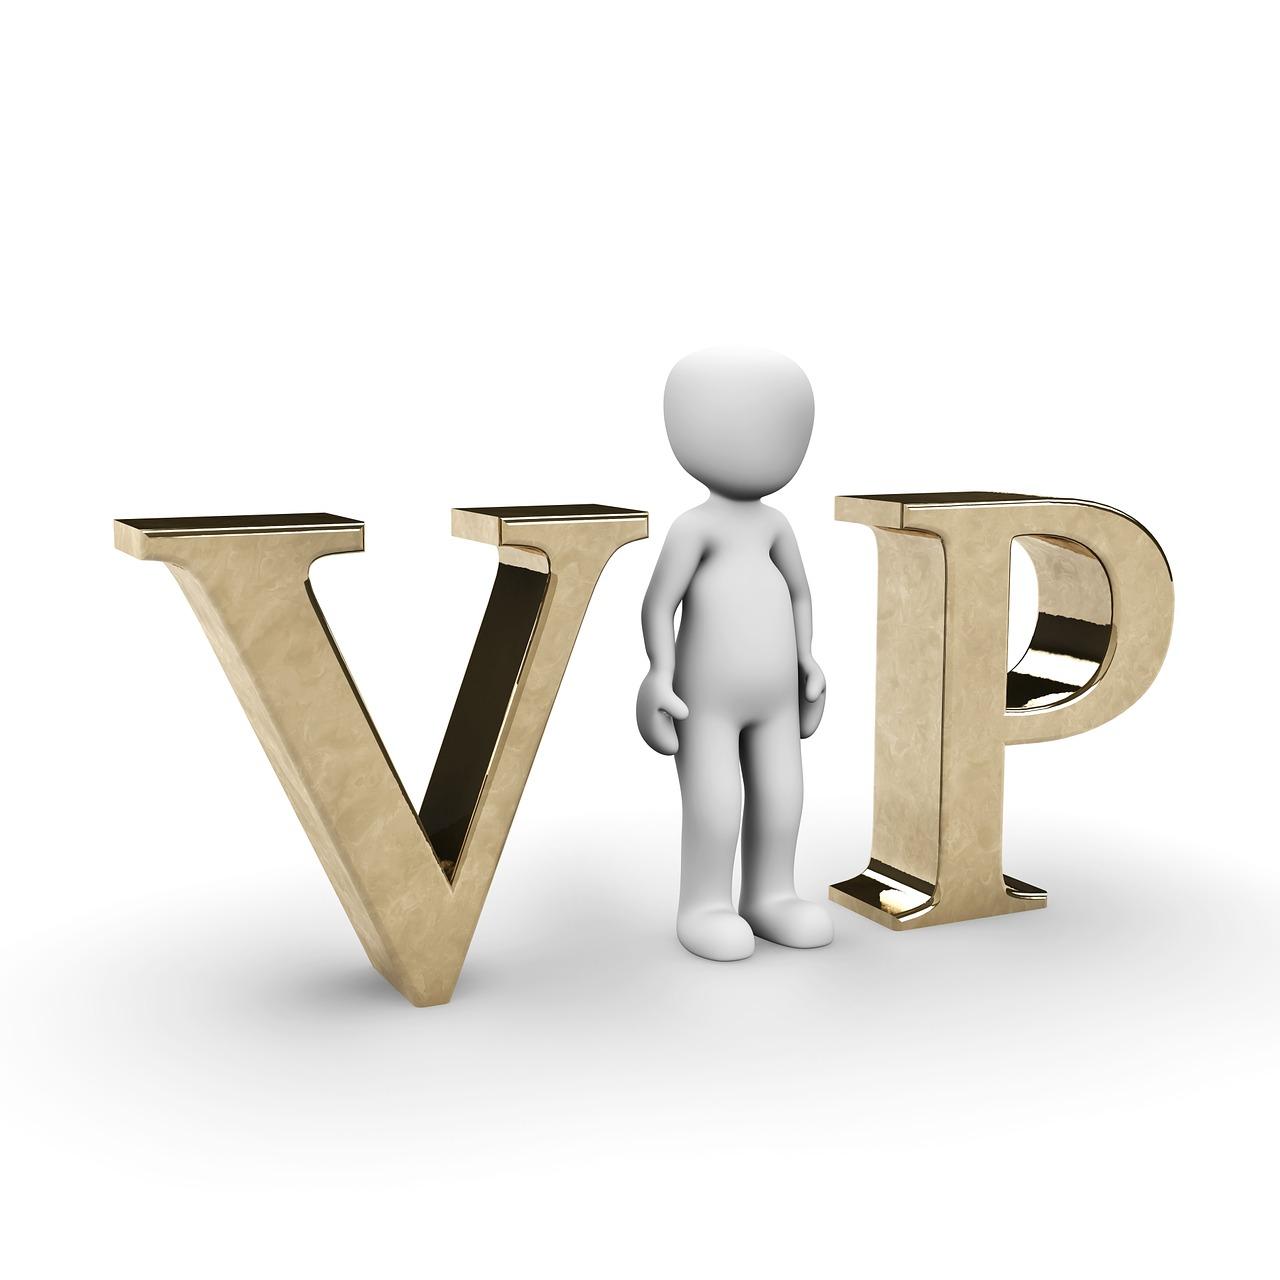 VIP12.02